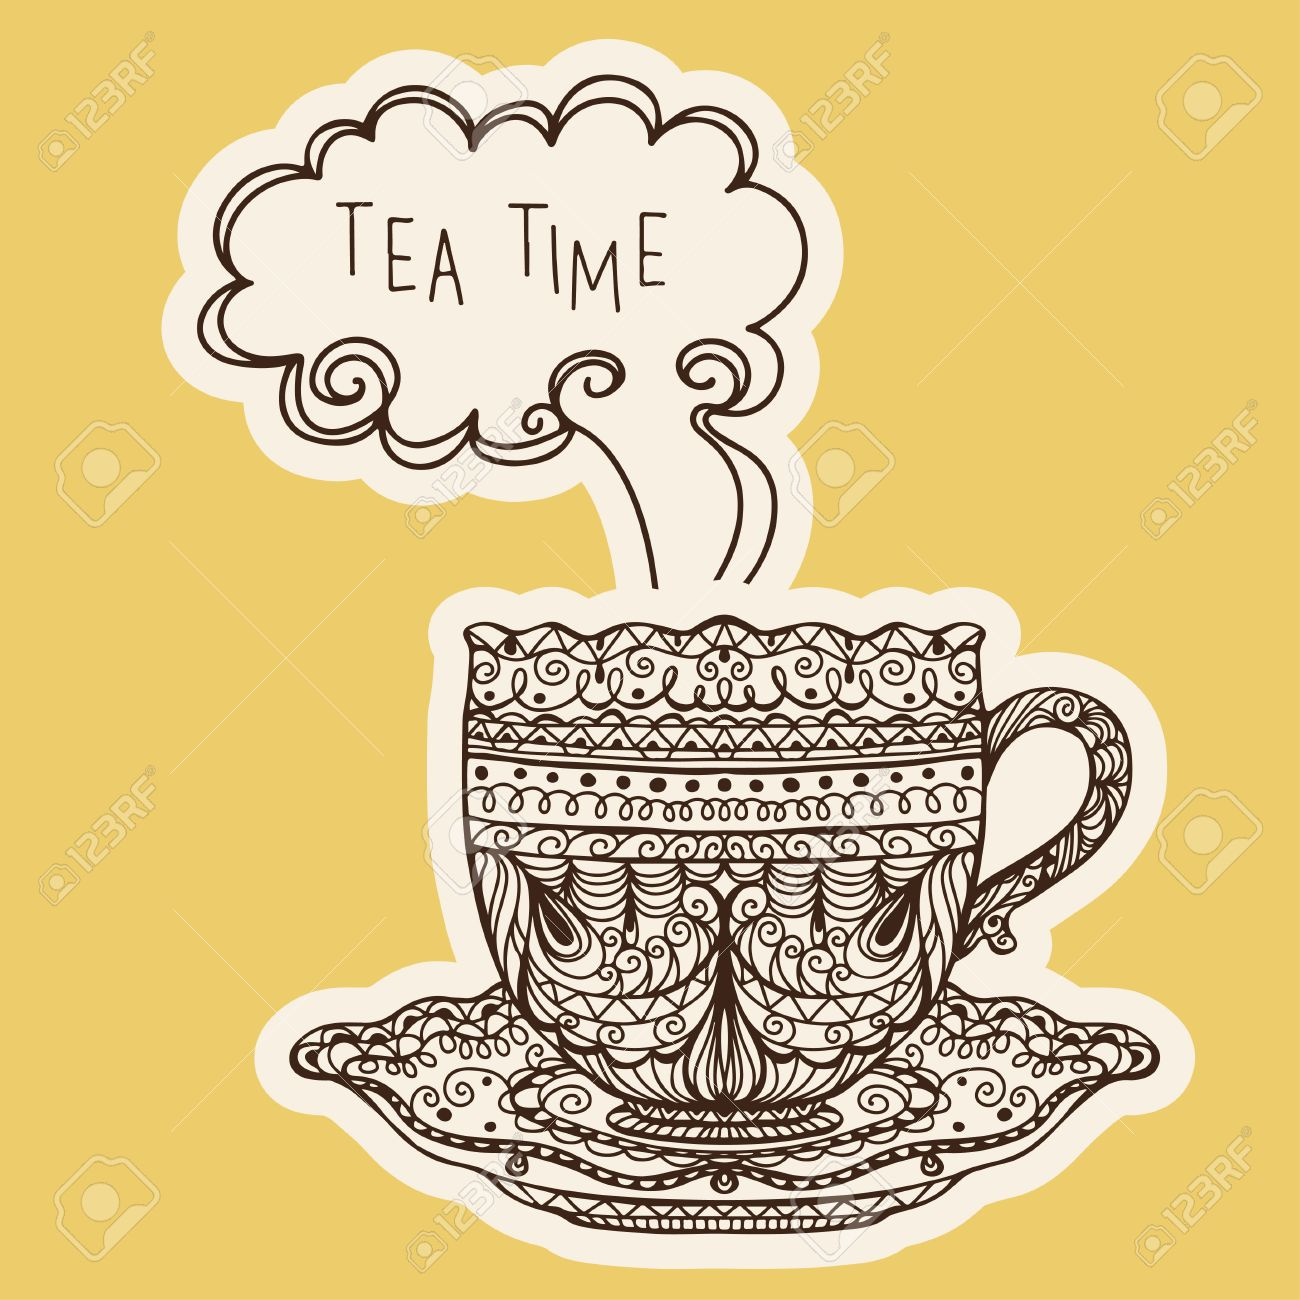 Elegant tea party invitation template with teacups cartoon vector - Vintage Tea Cup Icon Vector Stock Vector 22567468